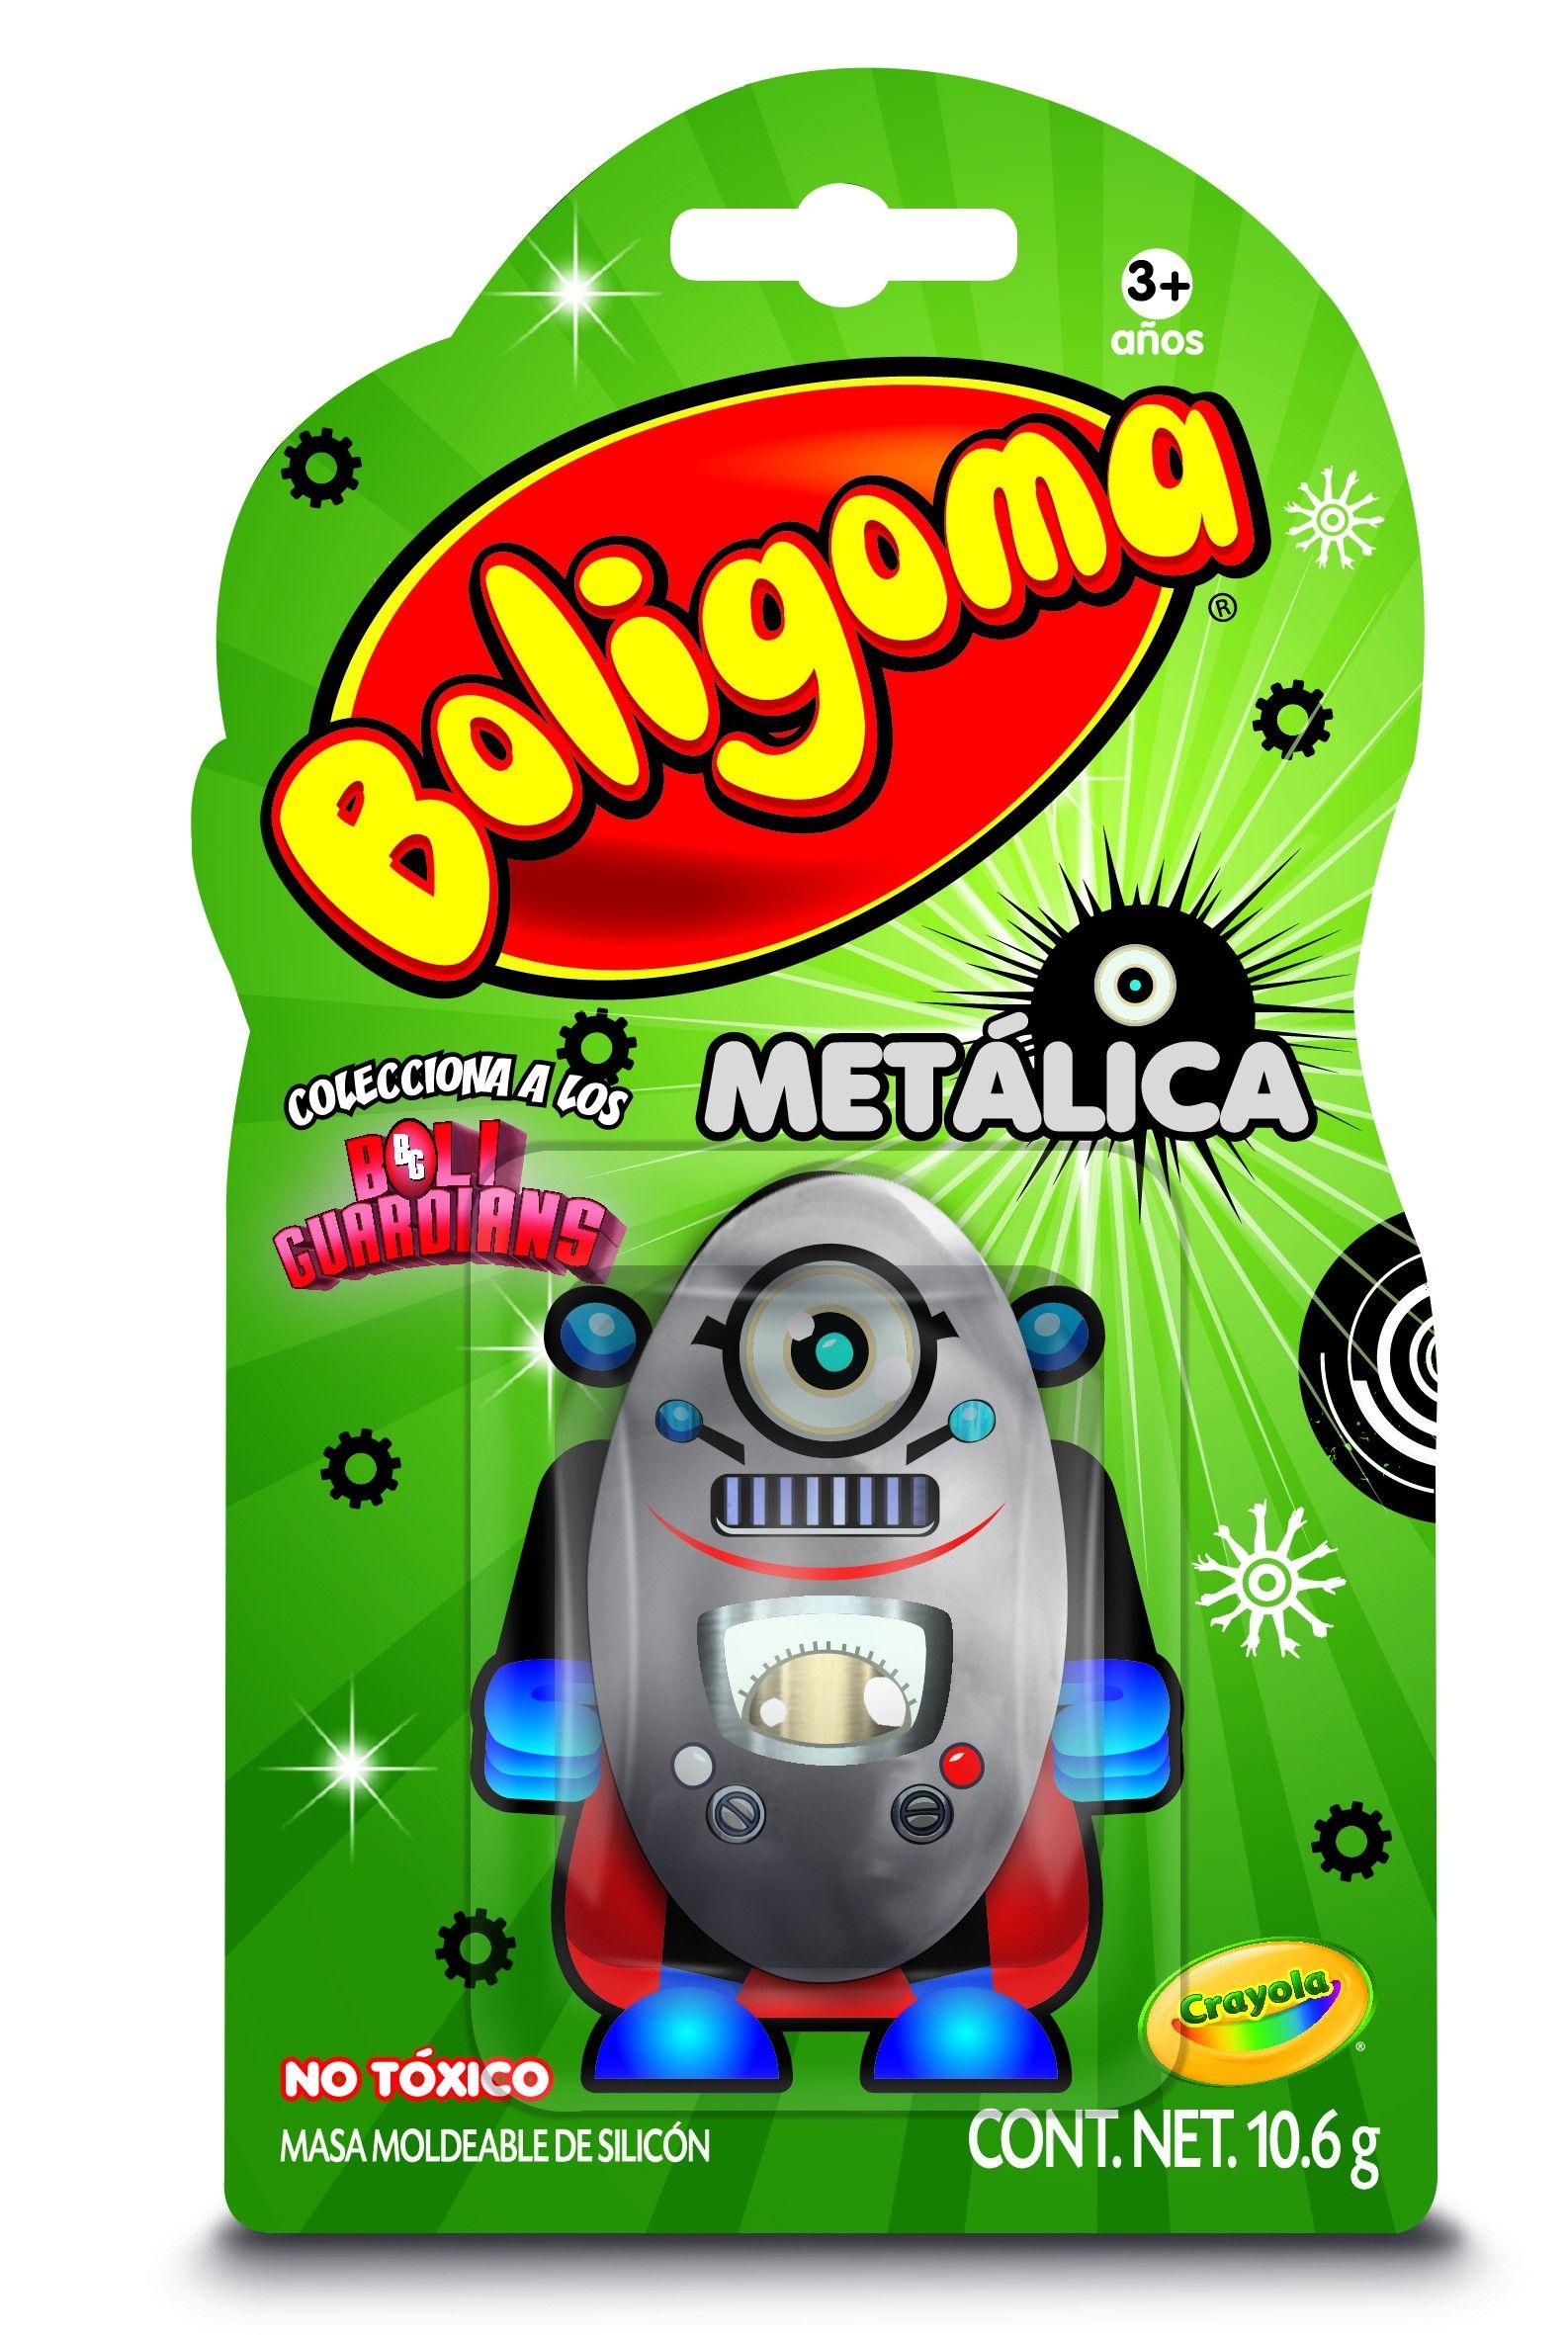 Boligoma Metálica Crayola